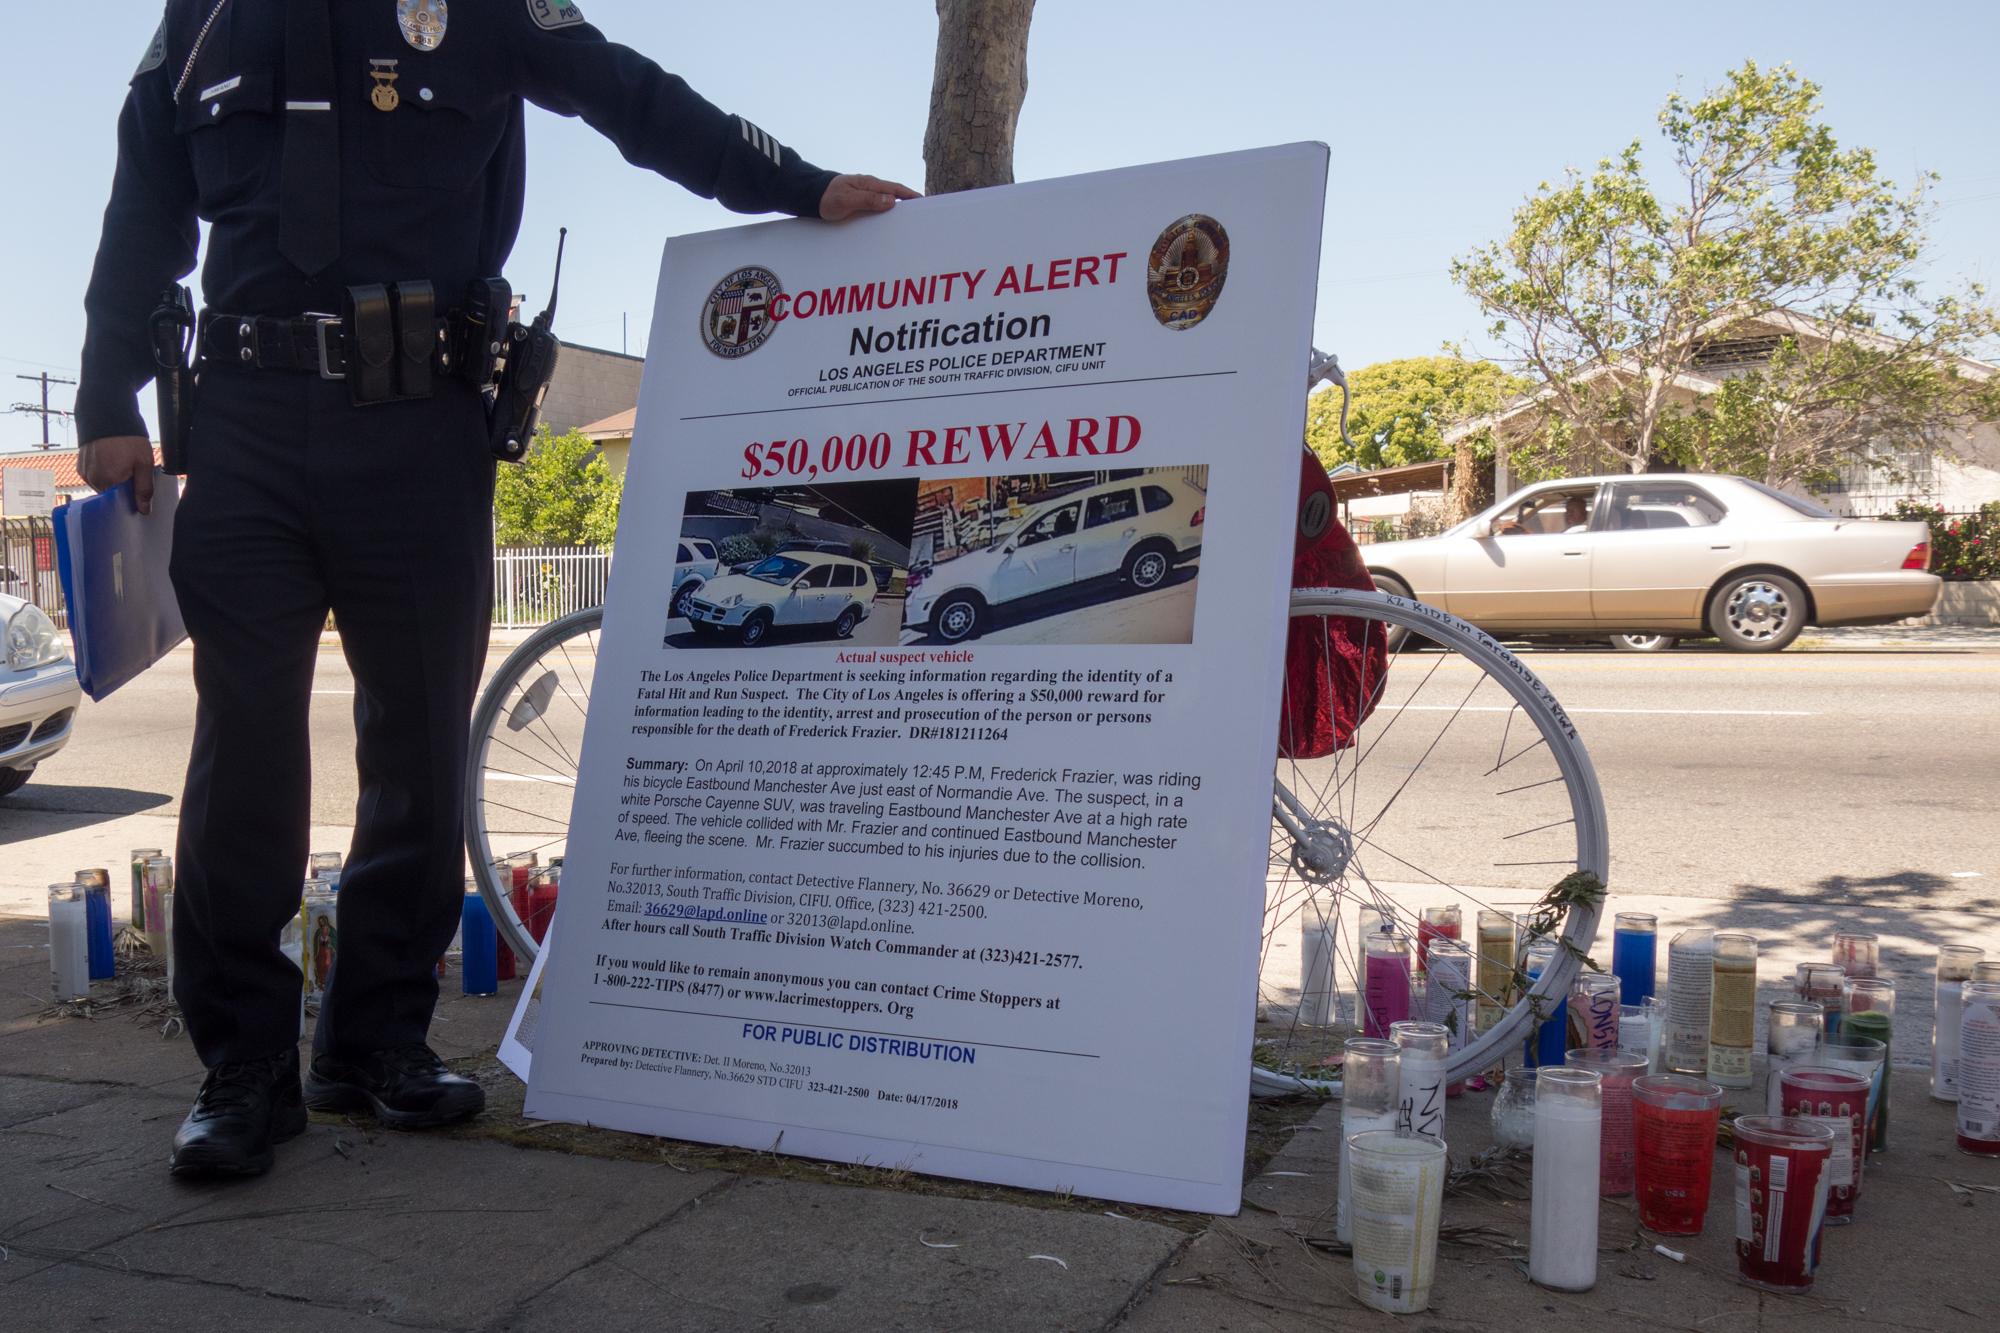 Traffic deaths mount in South LA following death of